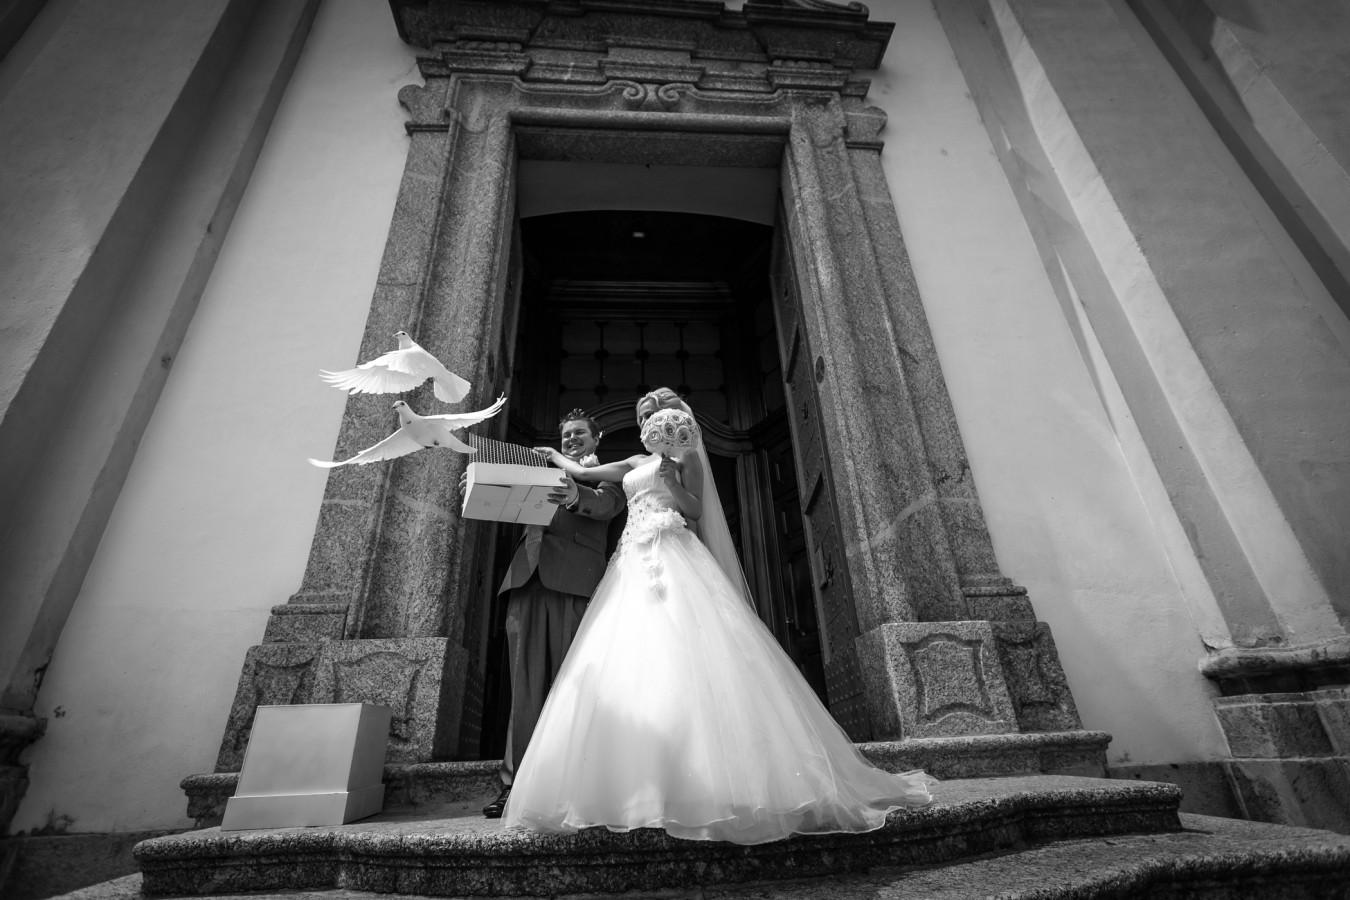 lake_wedding_in_italy_16-1350×900